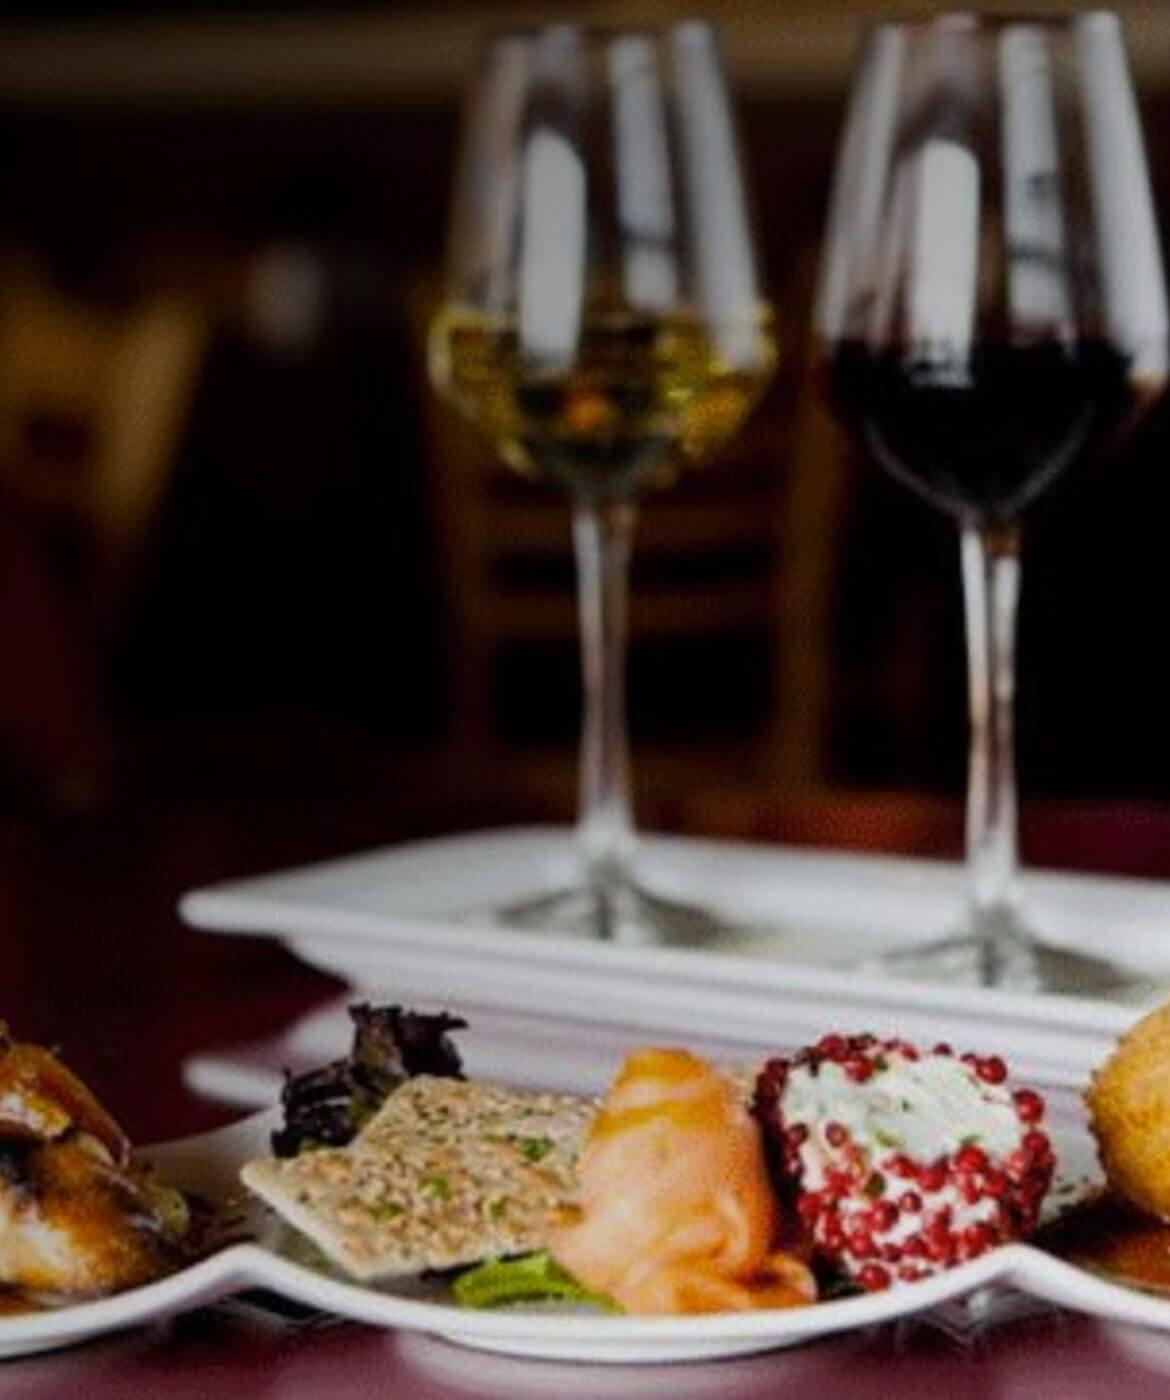 Mixed Dozen Wine Guide - SA wines online